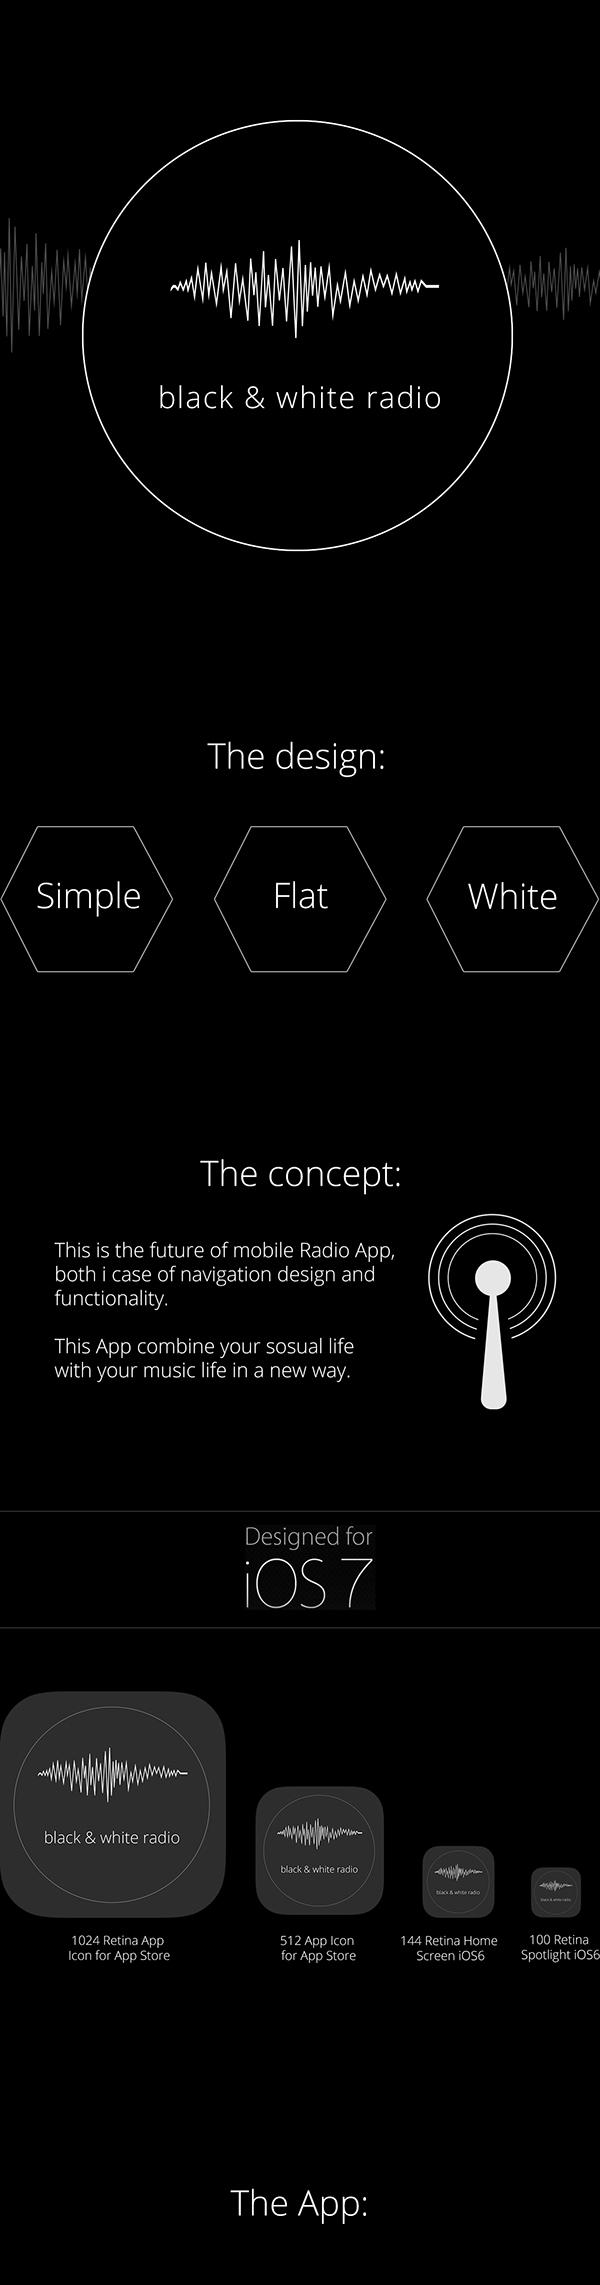 app app design Appdesign black and white Radio radio app mobile Mobile app allan ingwersen flat flat design black and whitedesign no colors Responsive Design Music Player